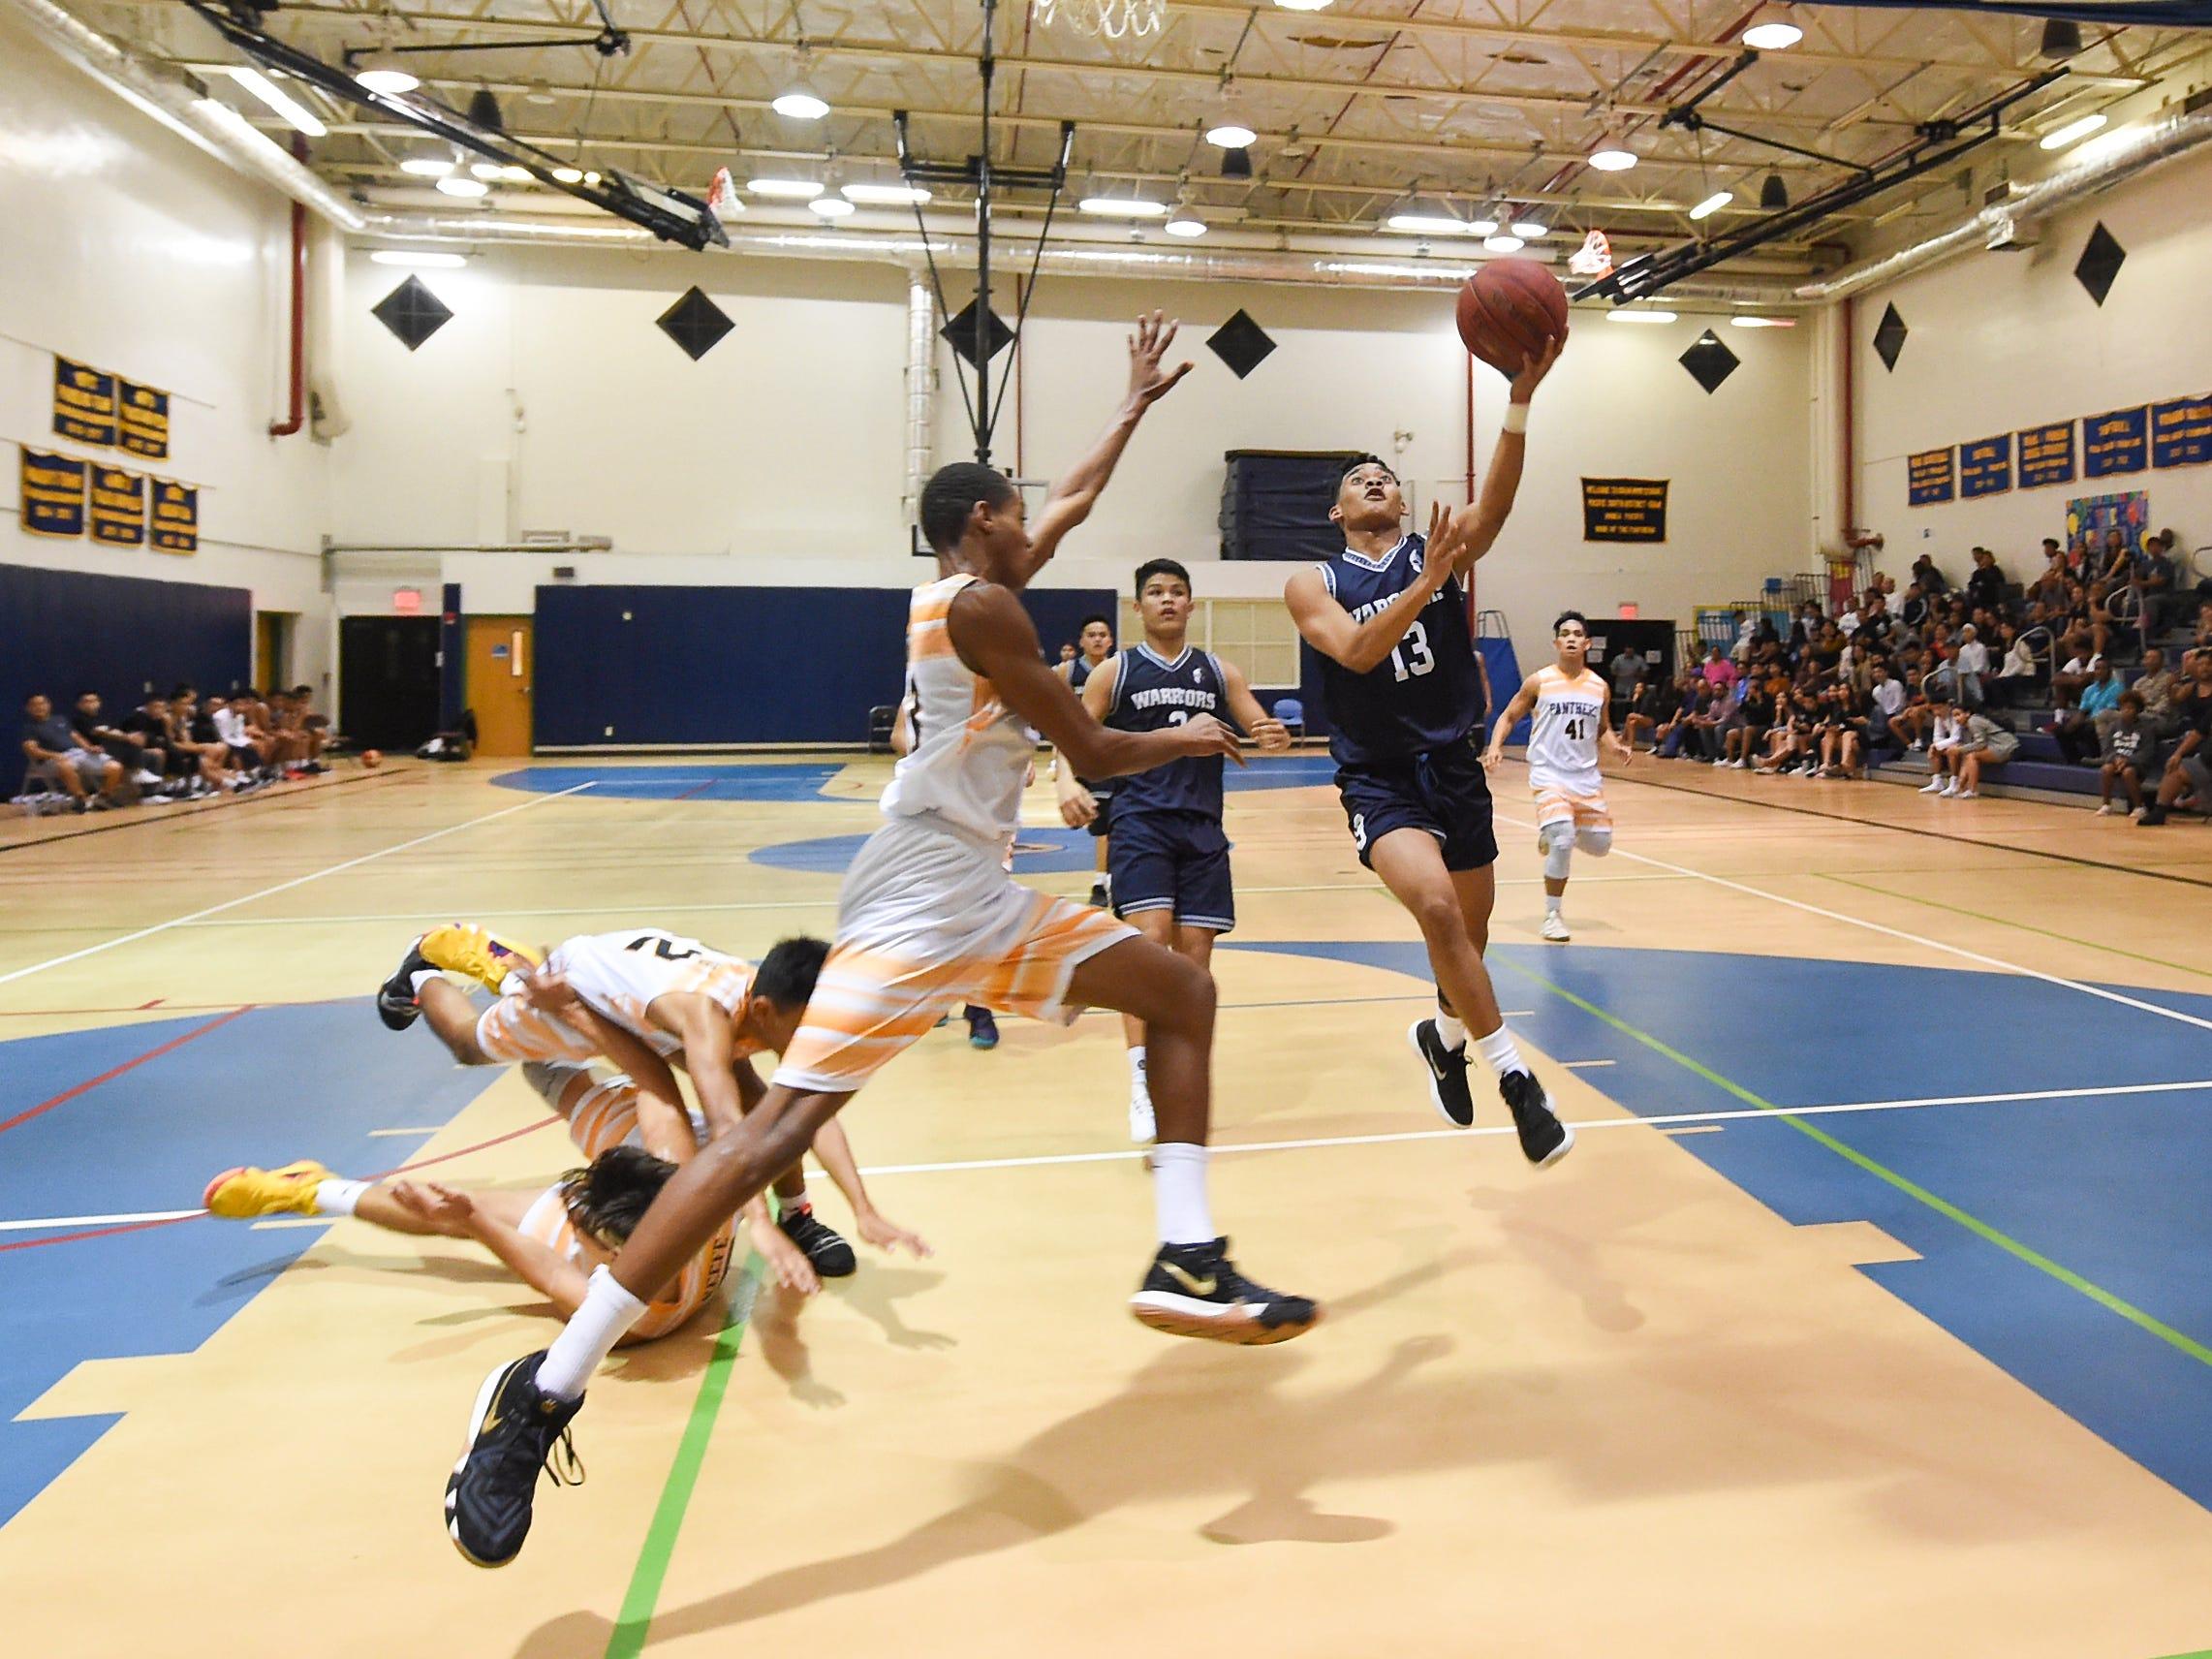 St. Paul player Jahmar White (13) attacks the rim during a IIAAG Boys' Basketball game at the Guam High School Gym, Feb. 5, 2019.